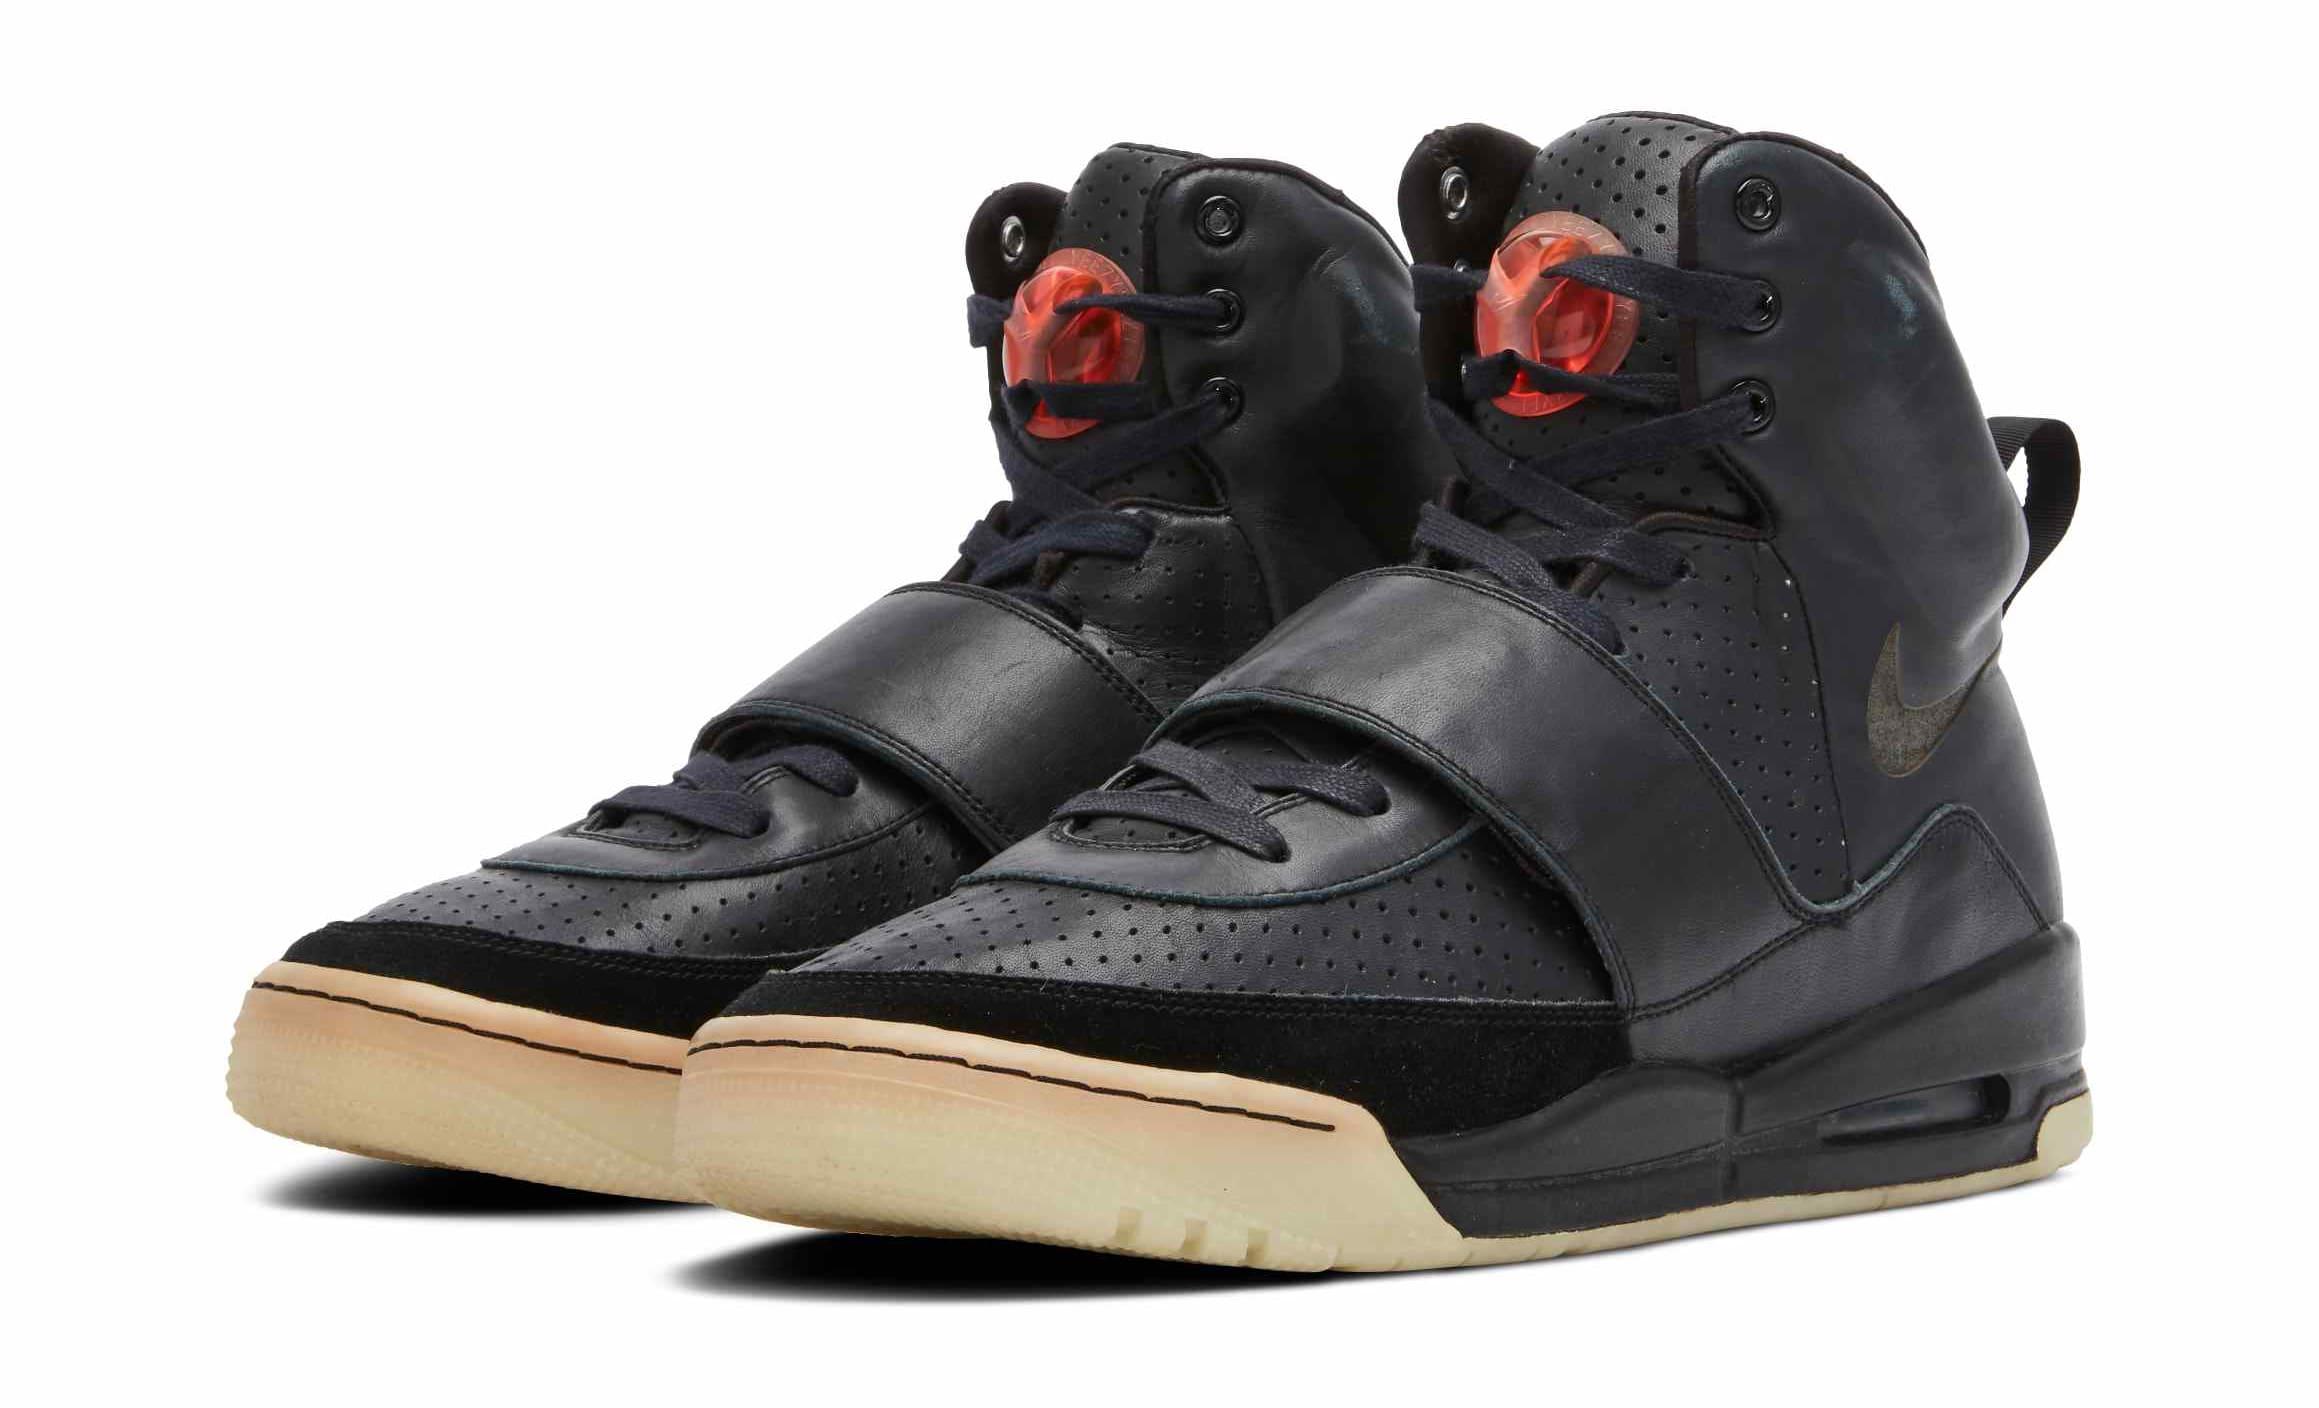 Nike Air Yeezy 1 Grammy's Sample Pair